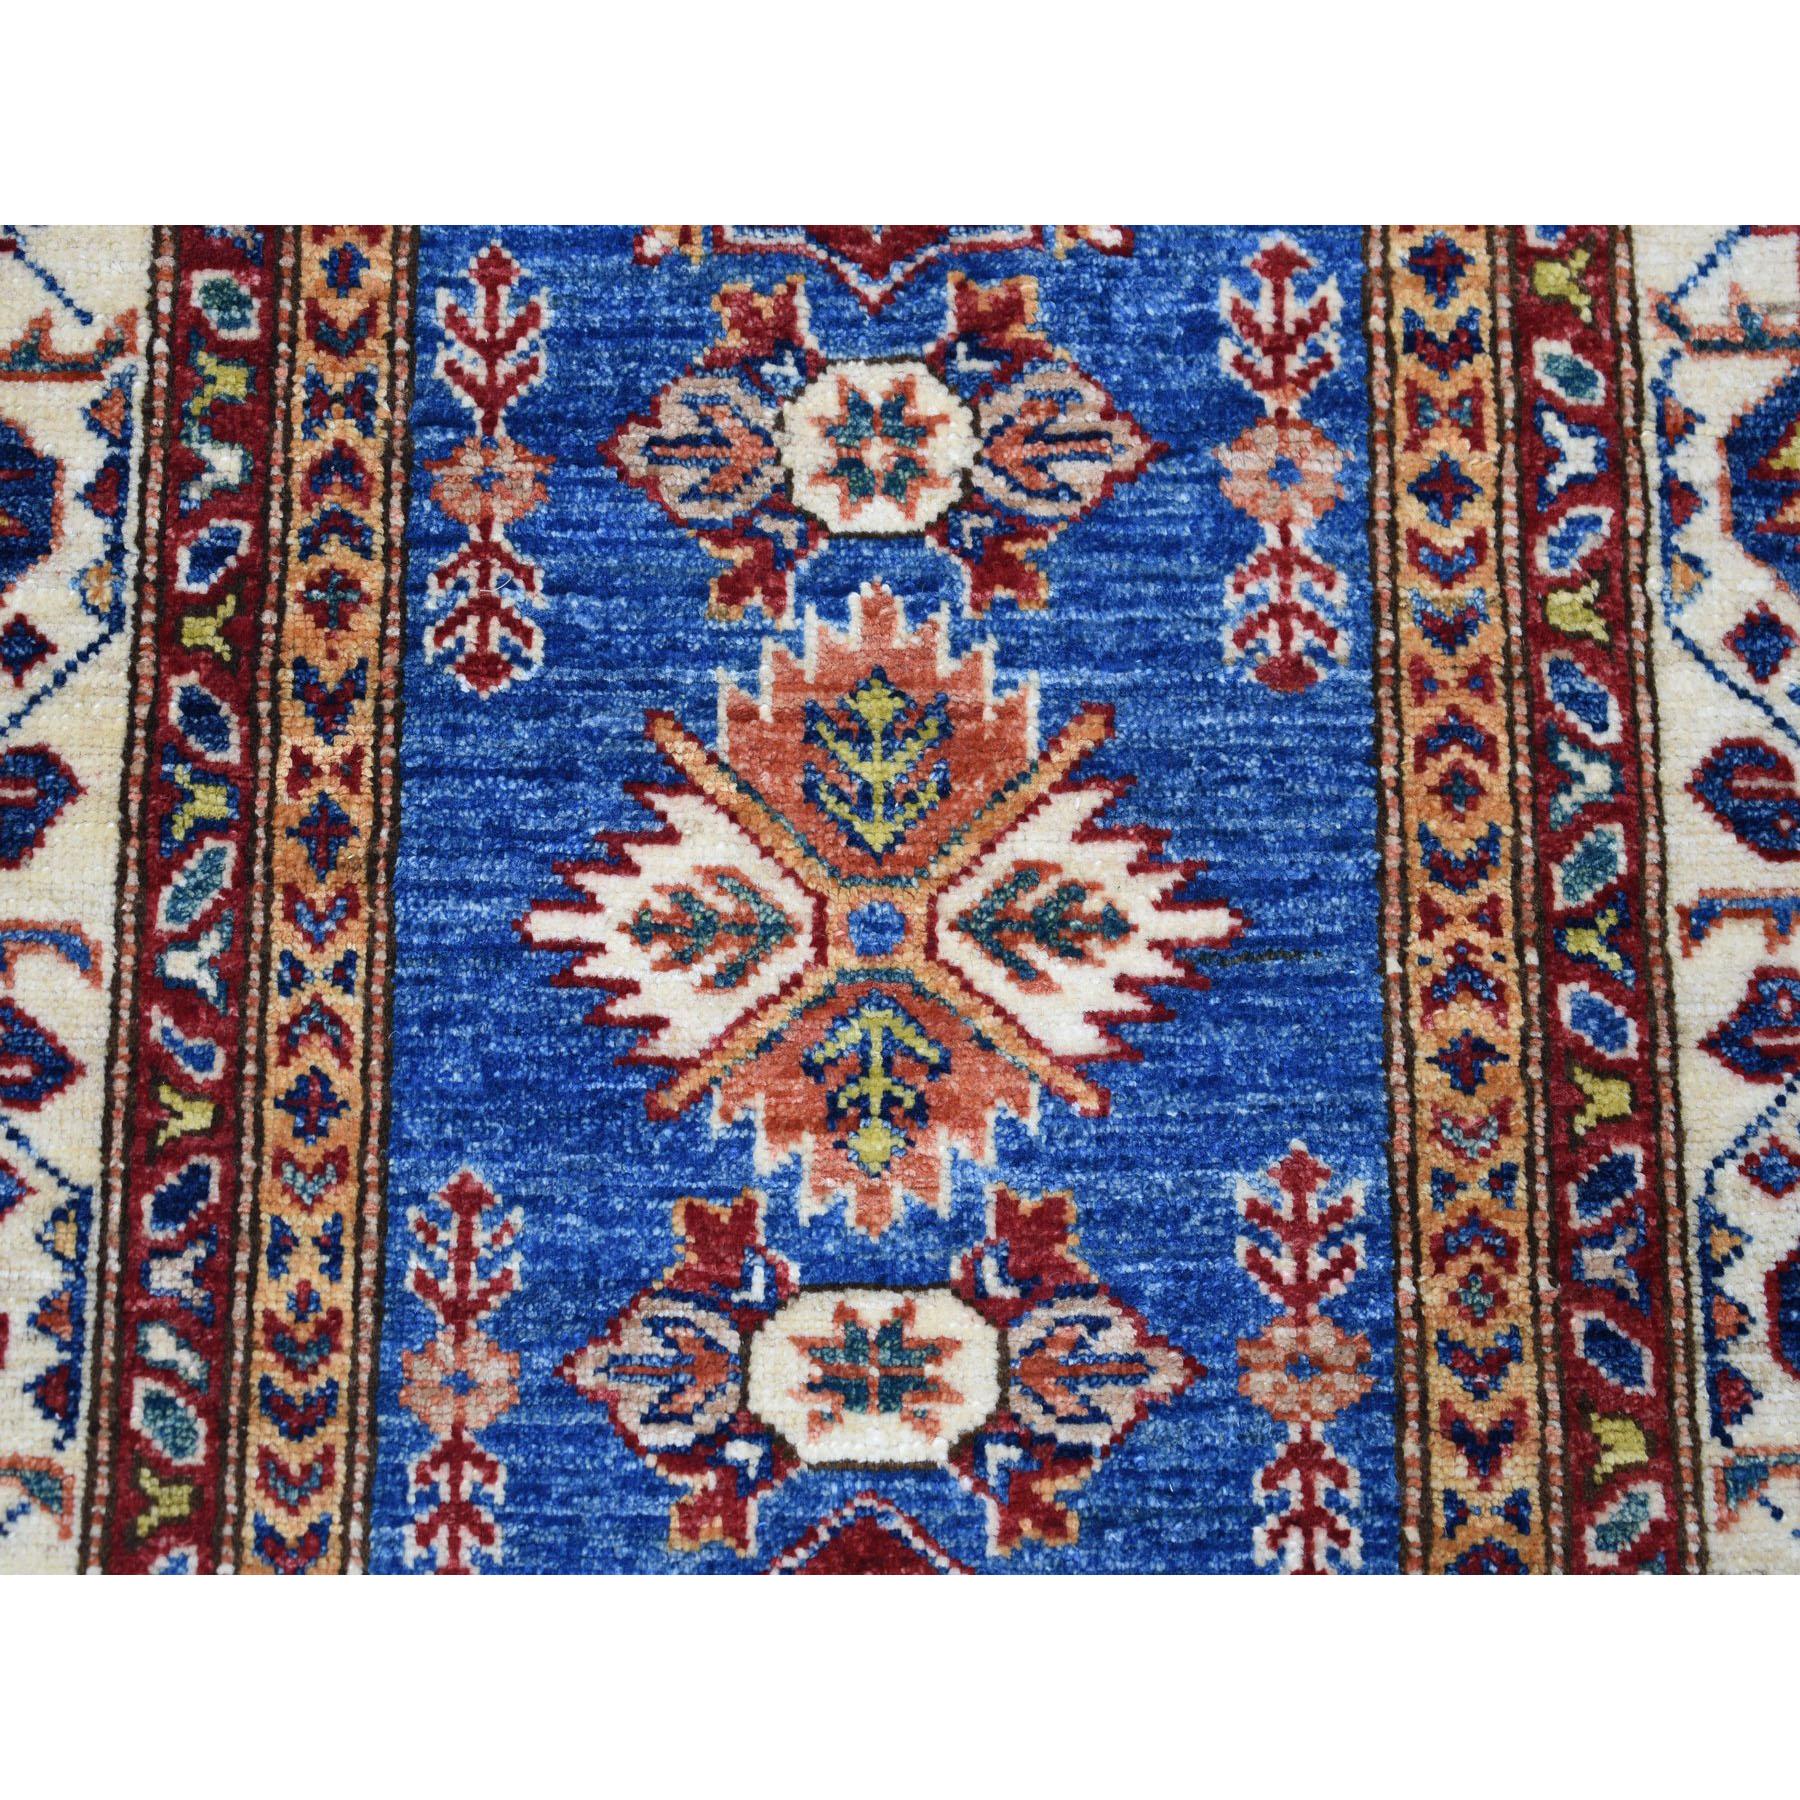 2-9 x4-2  Blue Super Kazak Pure Wool Geometric Design Hand-Knotted Oriental Rug